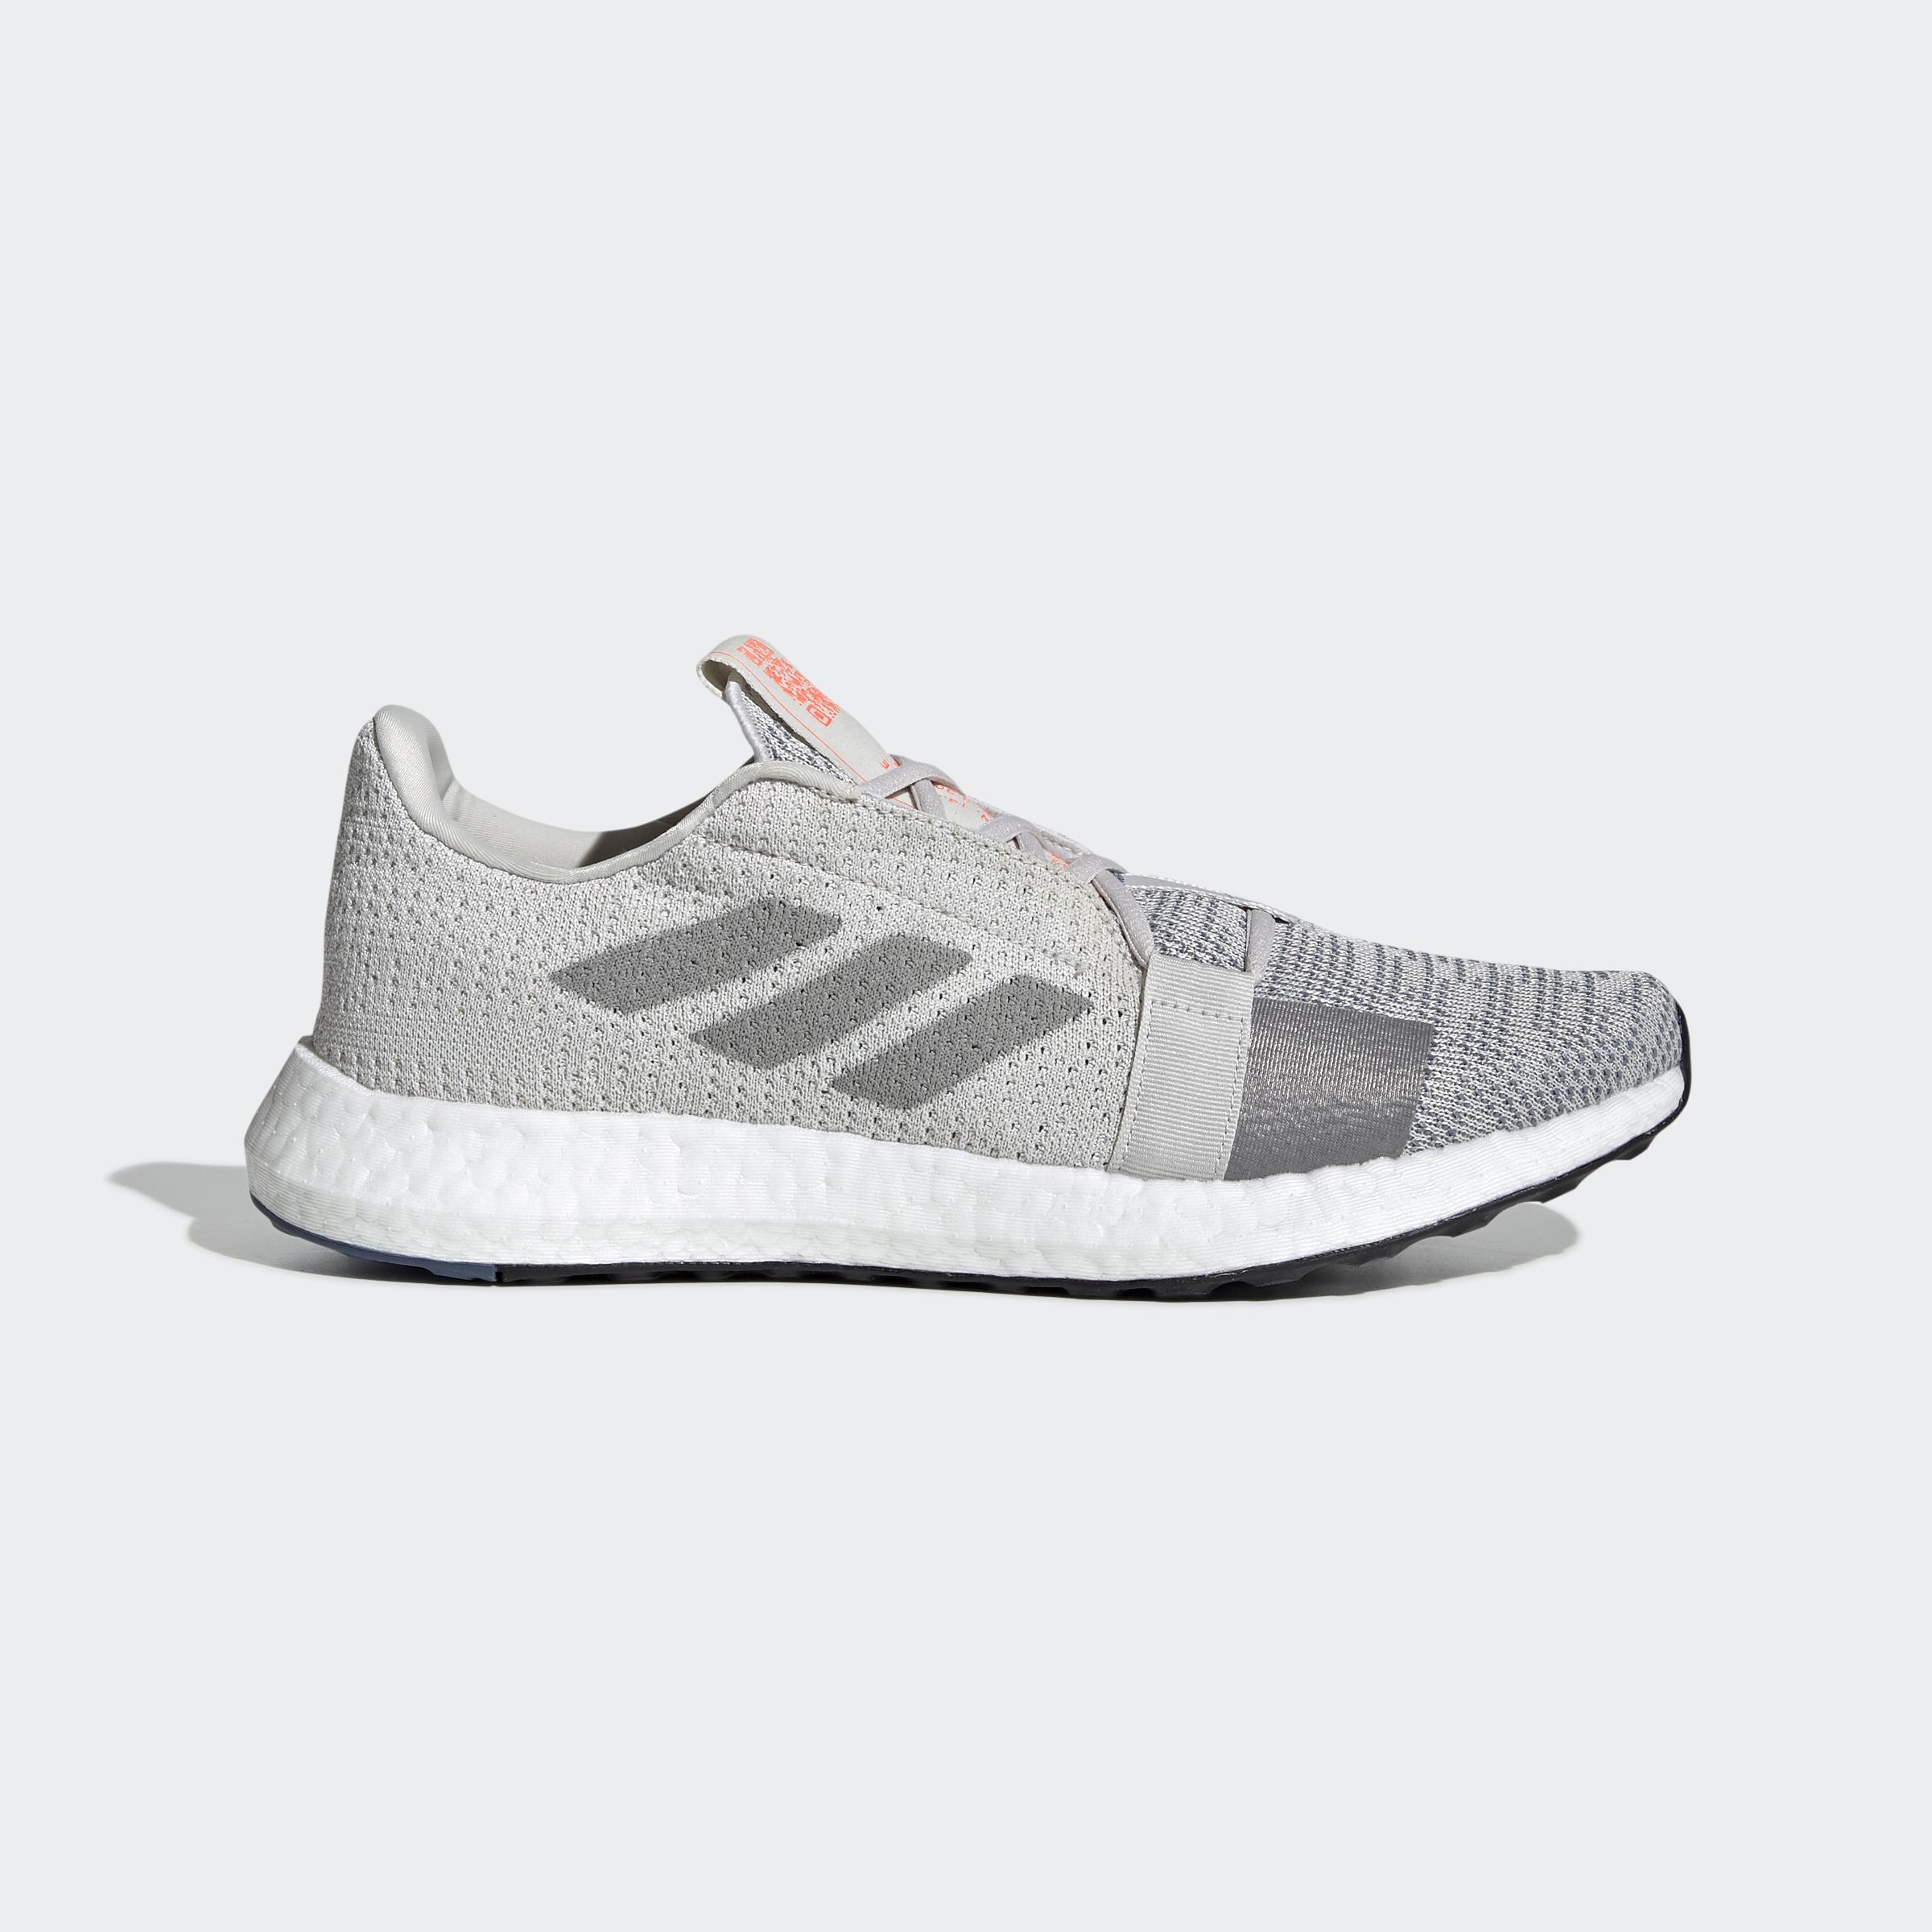 miniature 47 - adidas Senseboost Go Shoes Men's Athletic & Sneakers